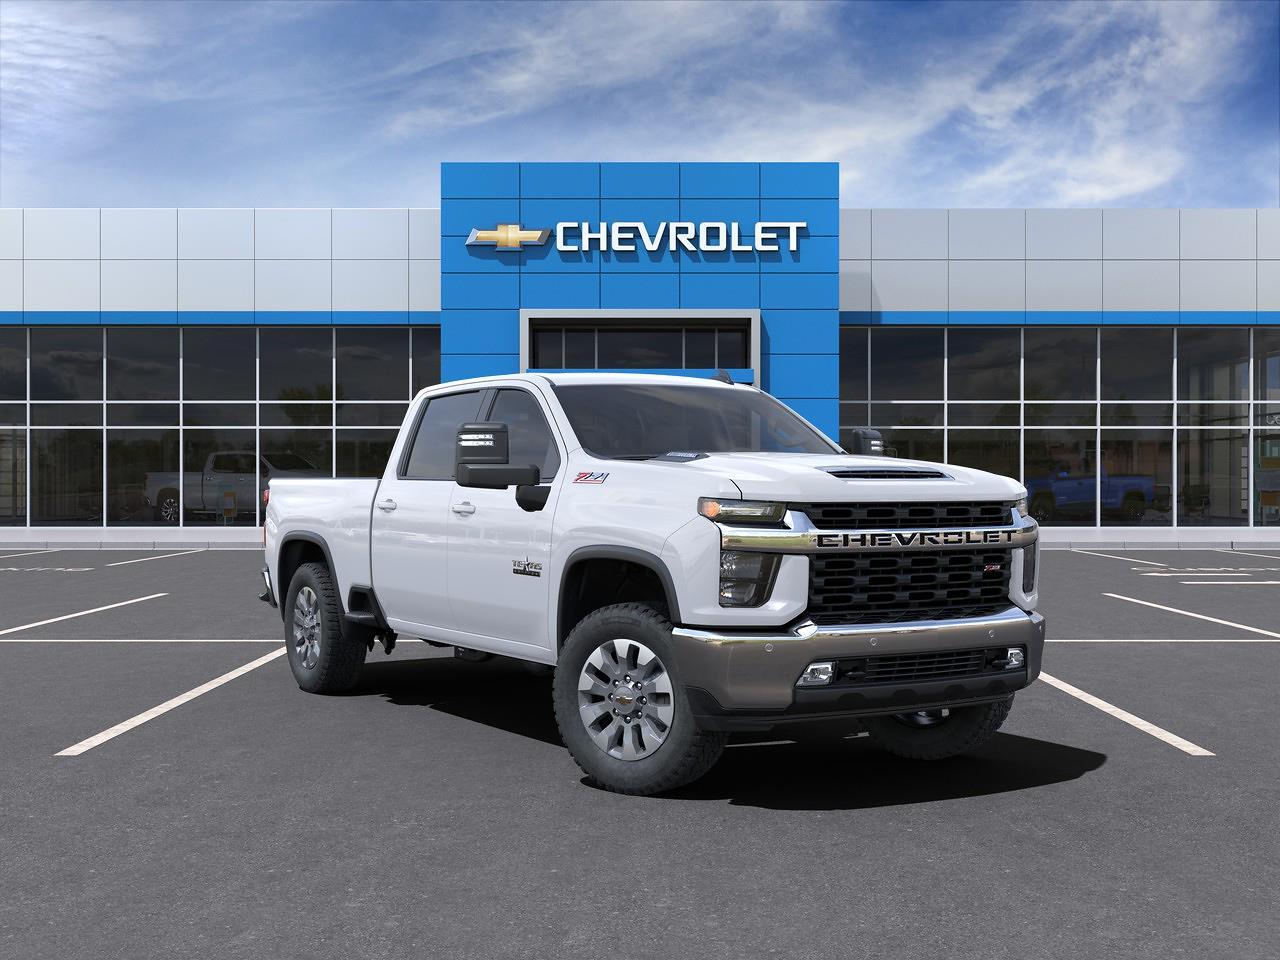 2021 Chevrolet Silverado 2500 Crew Cab 4x4, Pickup #150637 - photo 1